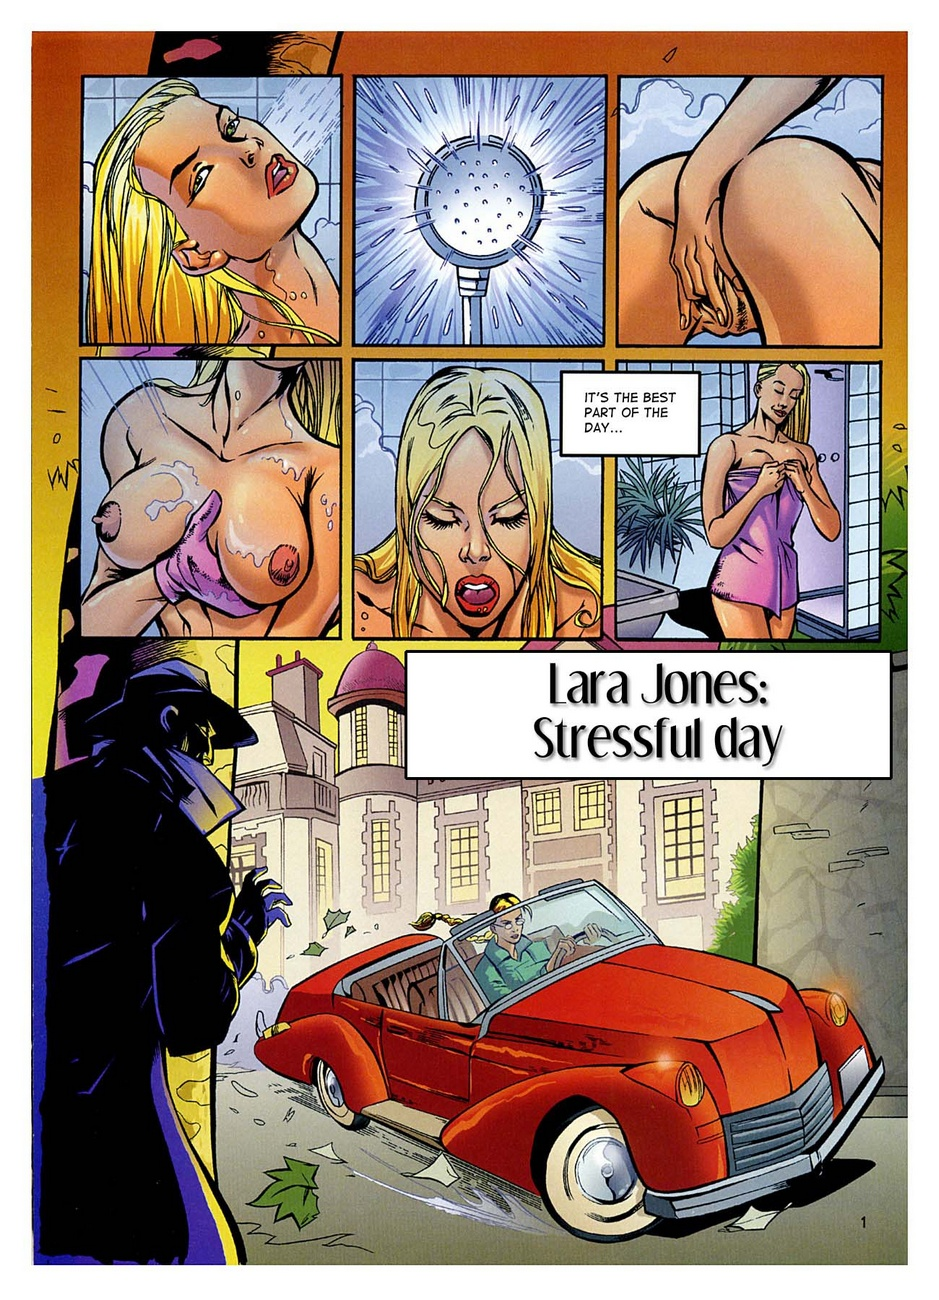 Lara Jones - Stressful Day